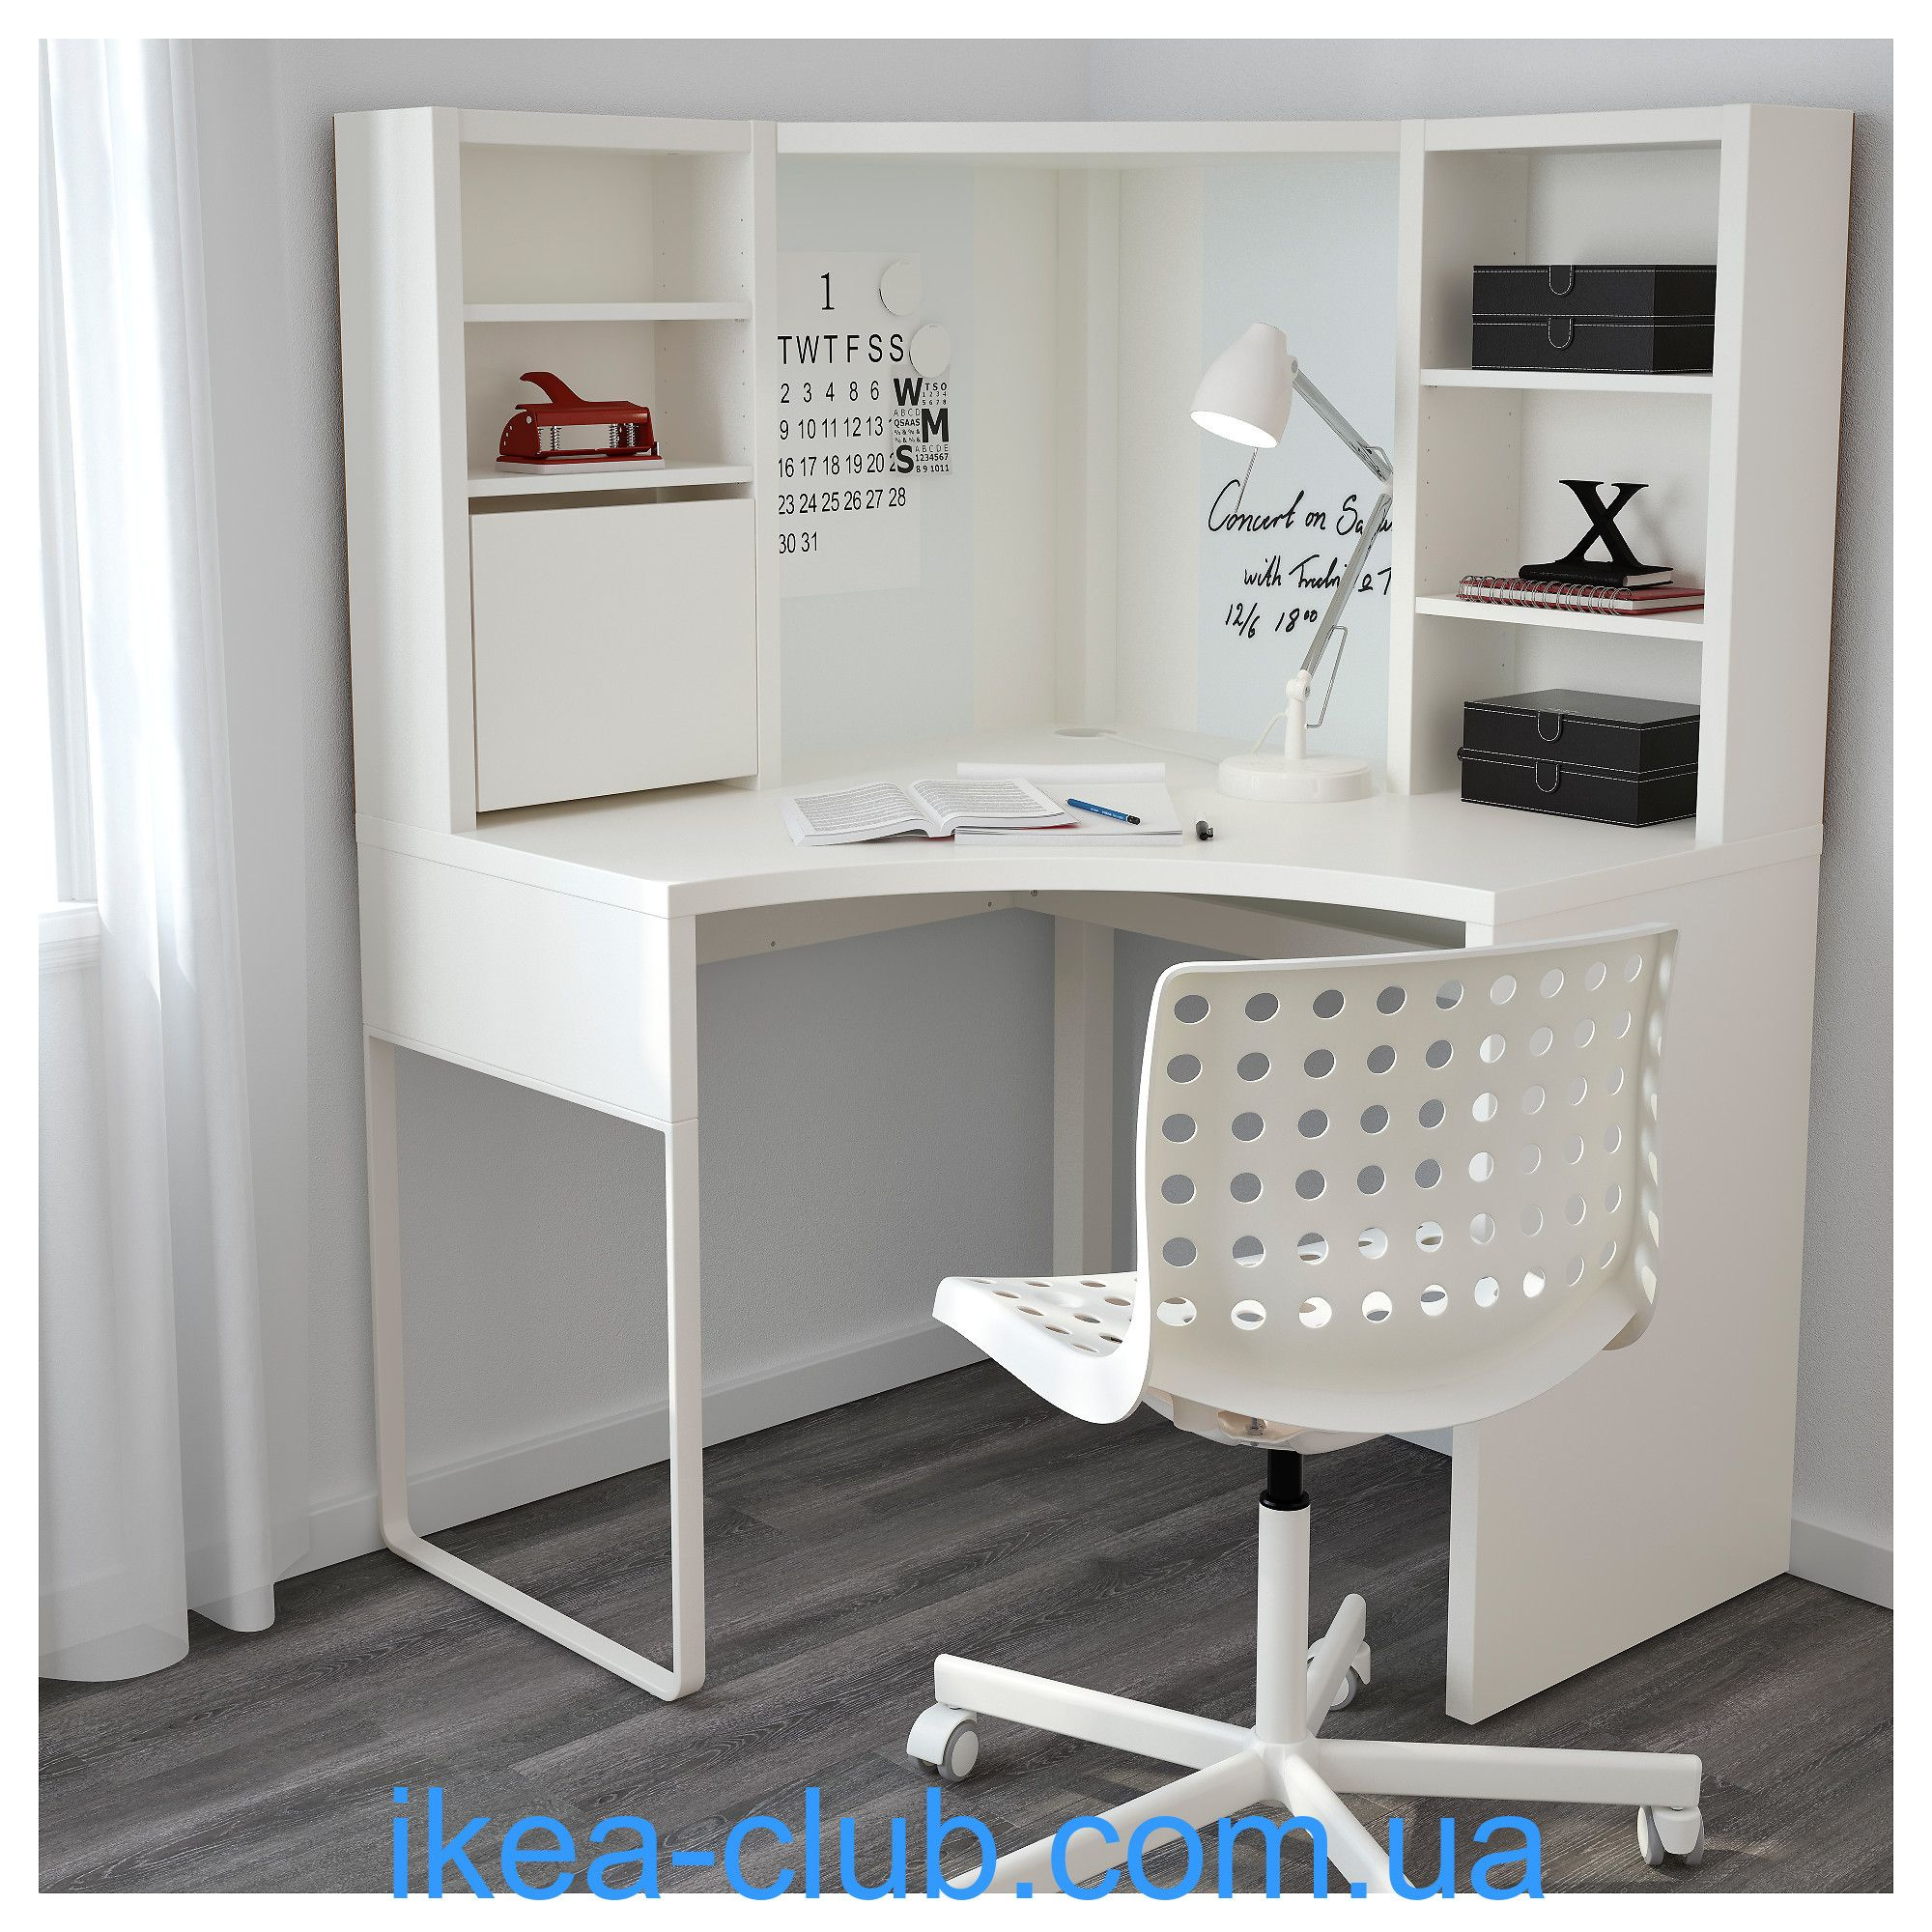 Ikea Mikke 502 507 13 Mebli Dlya Vitalni Malenki Spalni